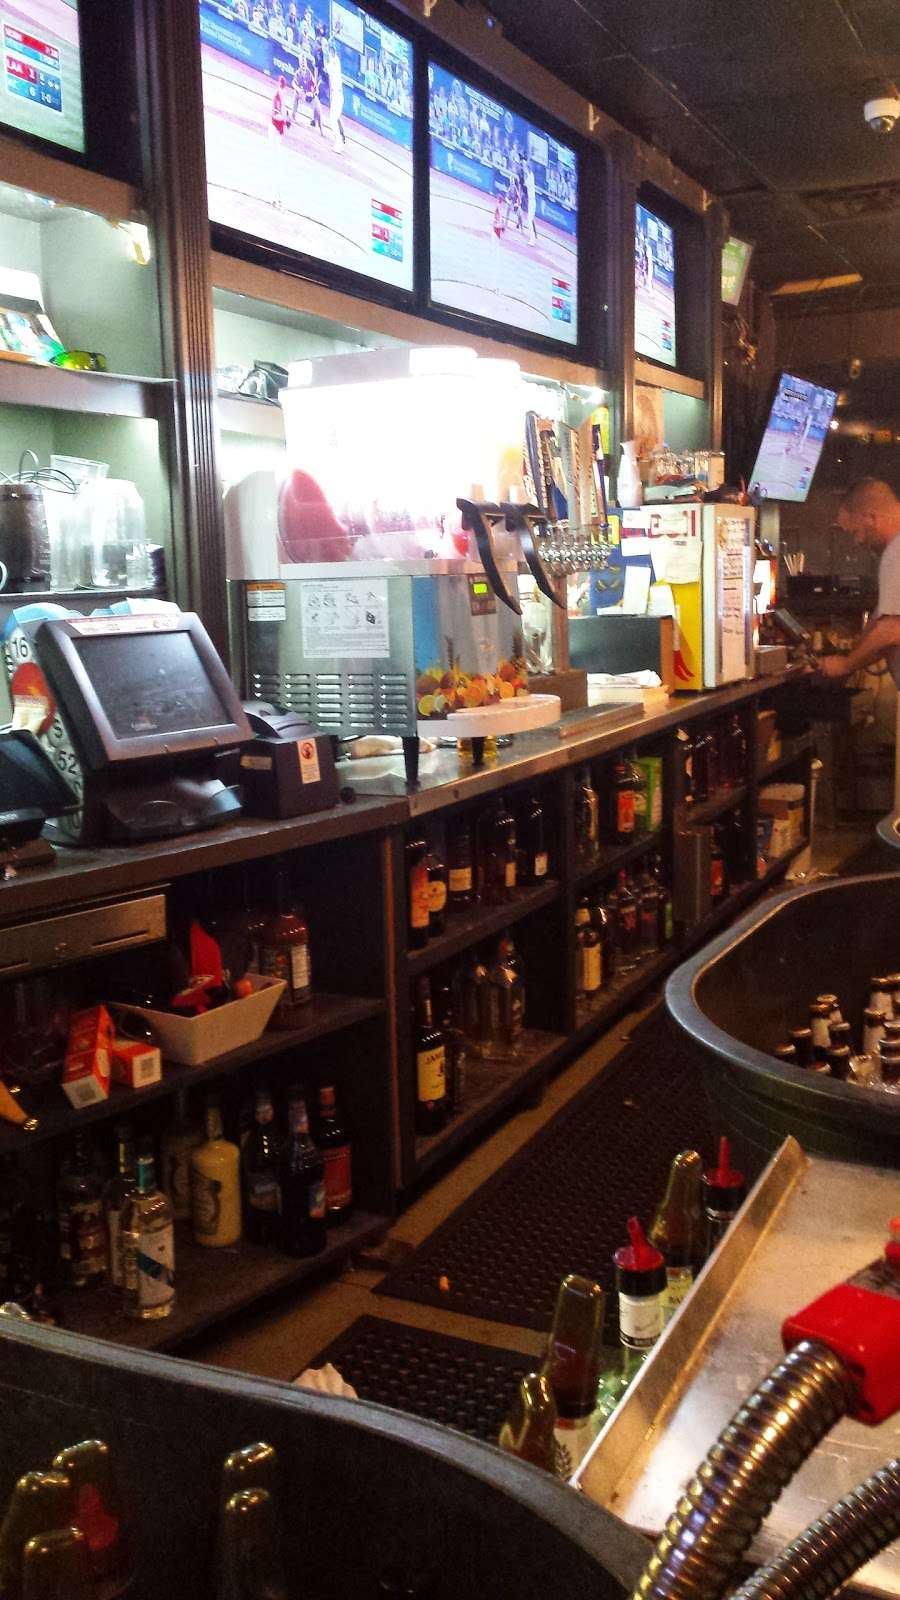 K Cs Neighborhood Bar & Grill - restaurant  | Photo 6 of 10 | Address: 10201 47th St, Shawnee, KS 66203, USA | Phone: (913) 262-7211